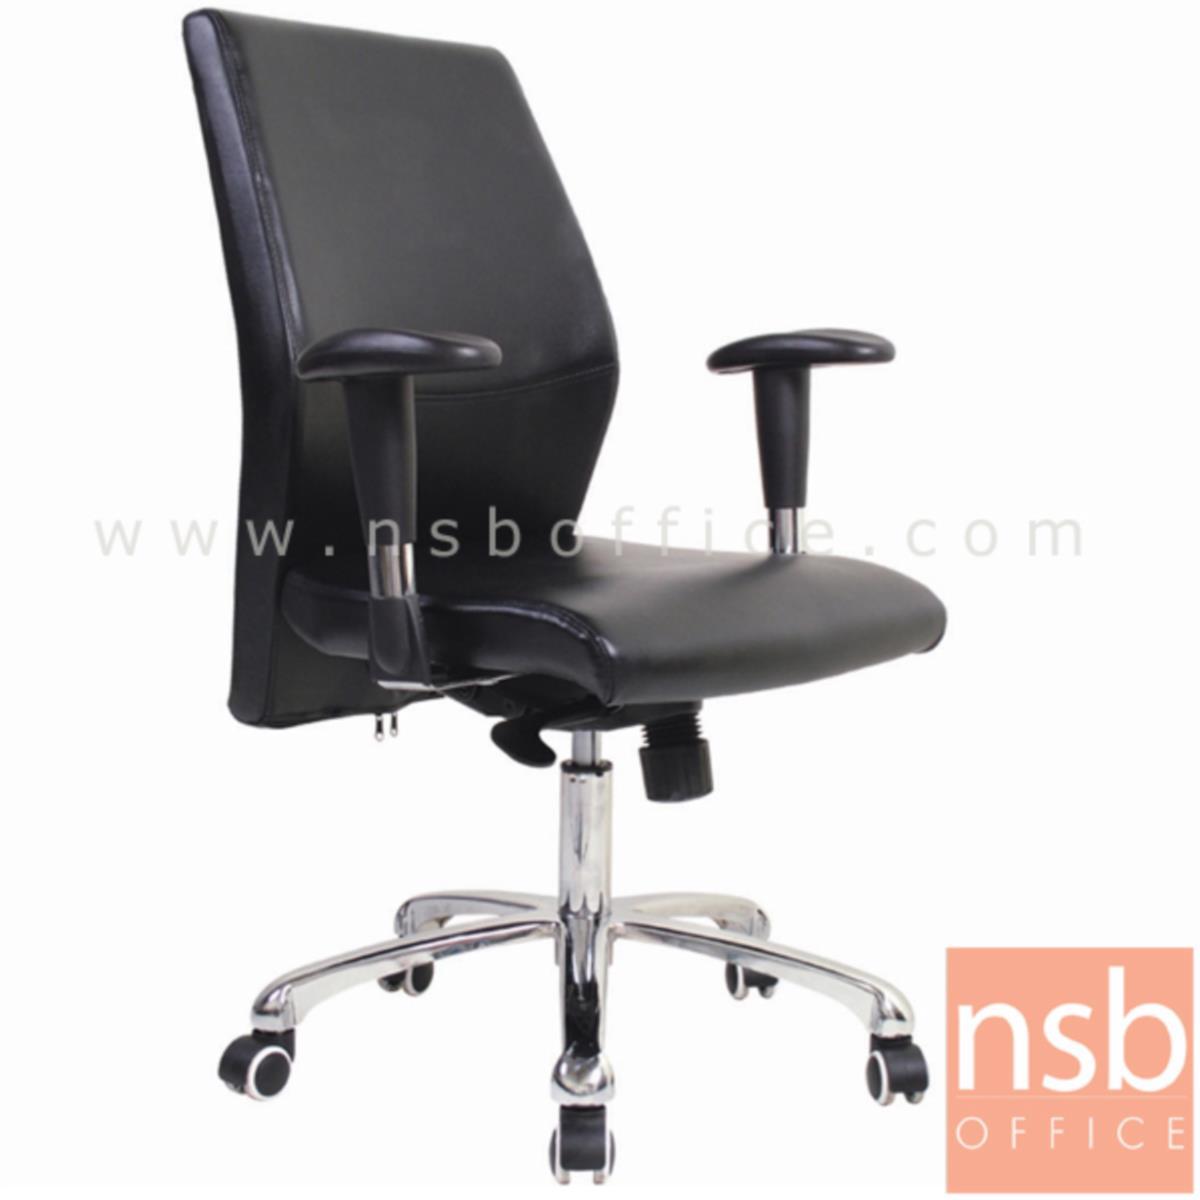 B26A018: เก้าอี้สำนักงาน รุ่น Goodpasture (กูดปาสเจอร์)  โช๊คแก๊ส มีก้อนโยก ขาเหล็กชุบโครเมี่ยม